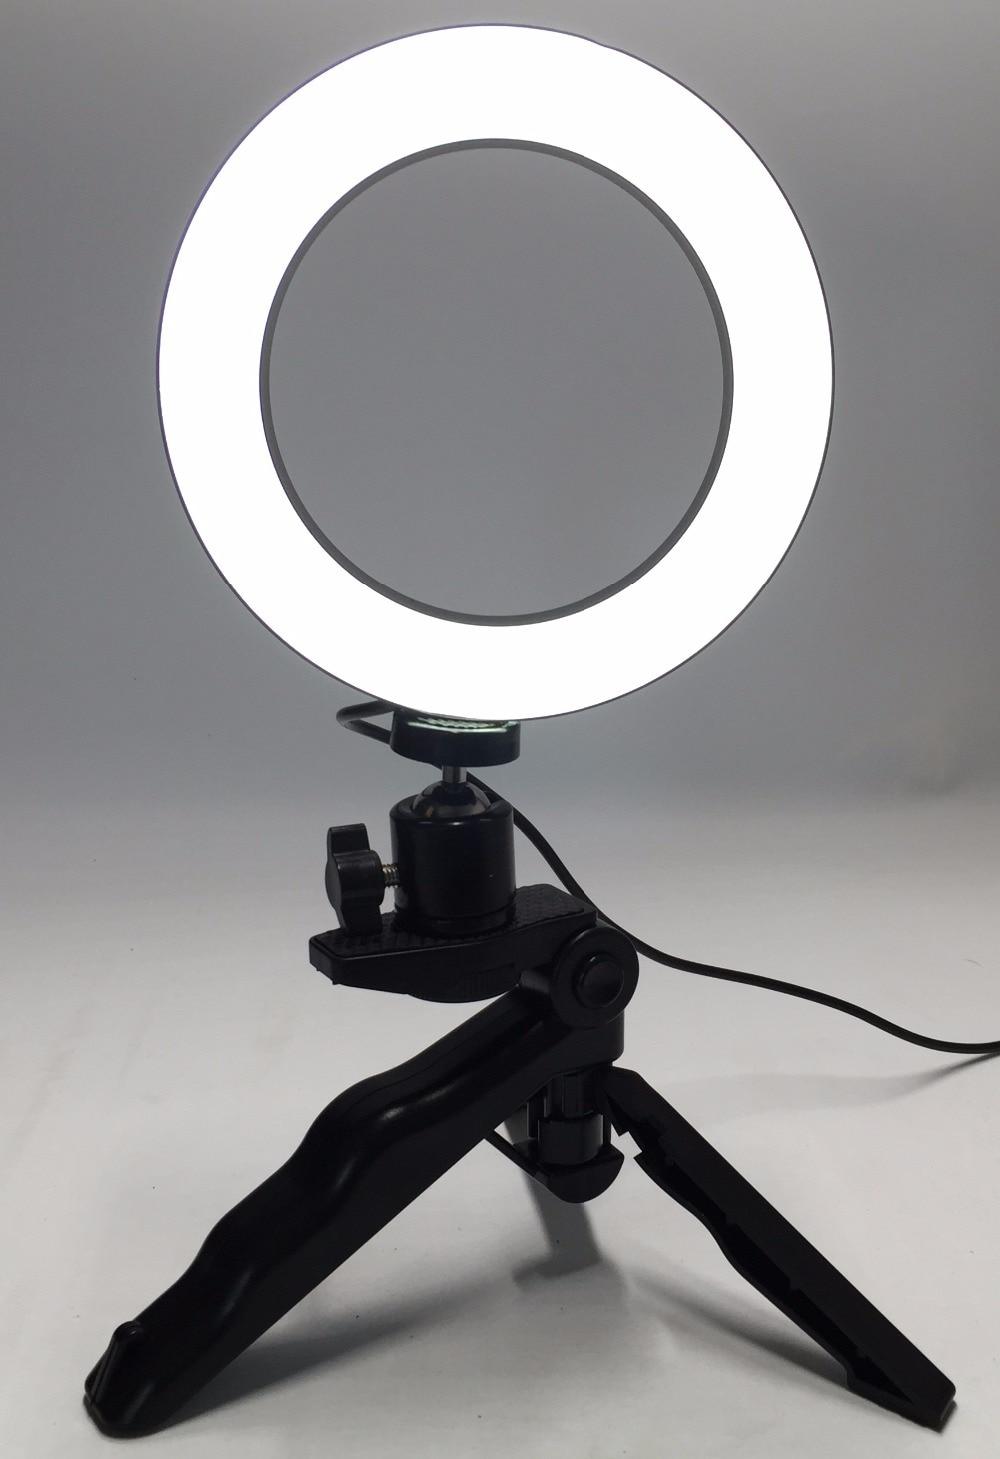 Photo Ring LED 14.5cm Photographic Lighting+Tripod Phone Video Photography Ring Light USB Line 3000k-6000k White Yellow Color